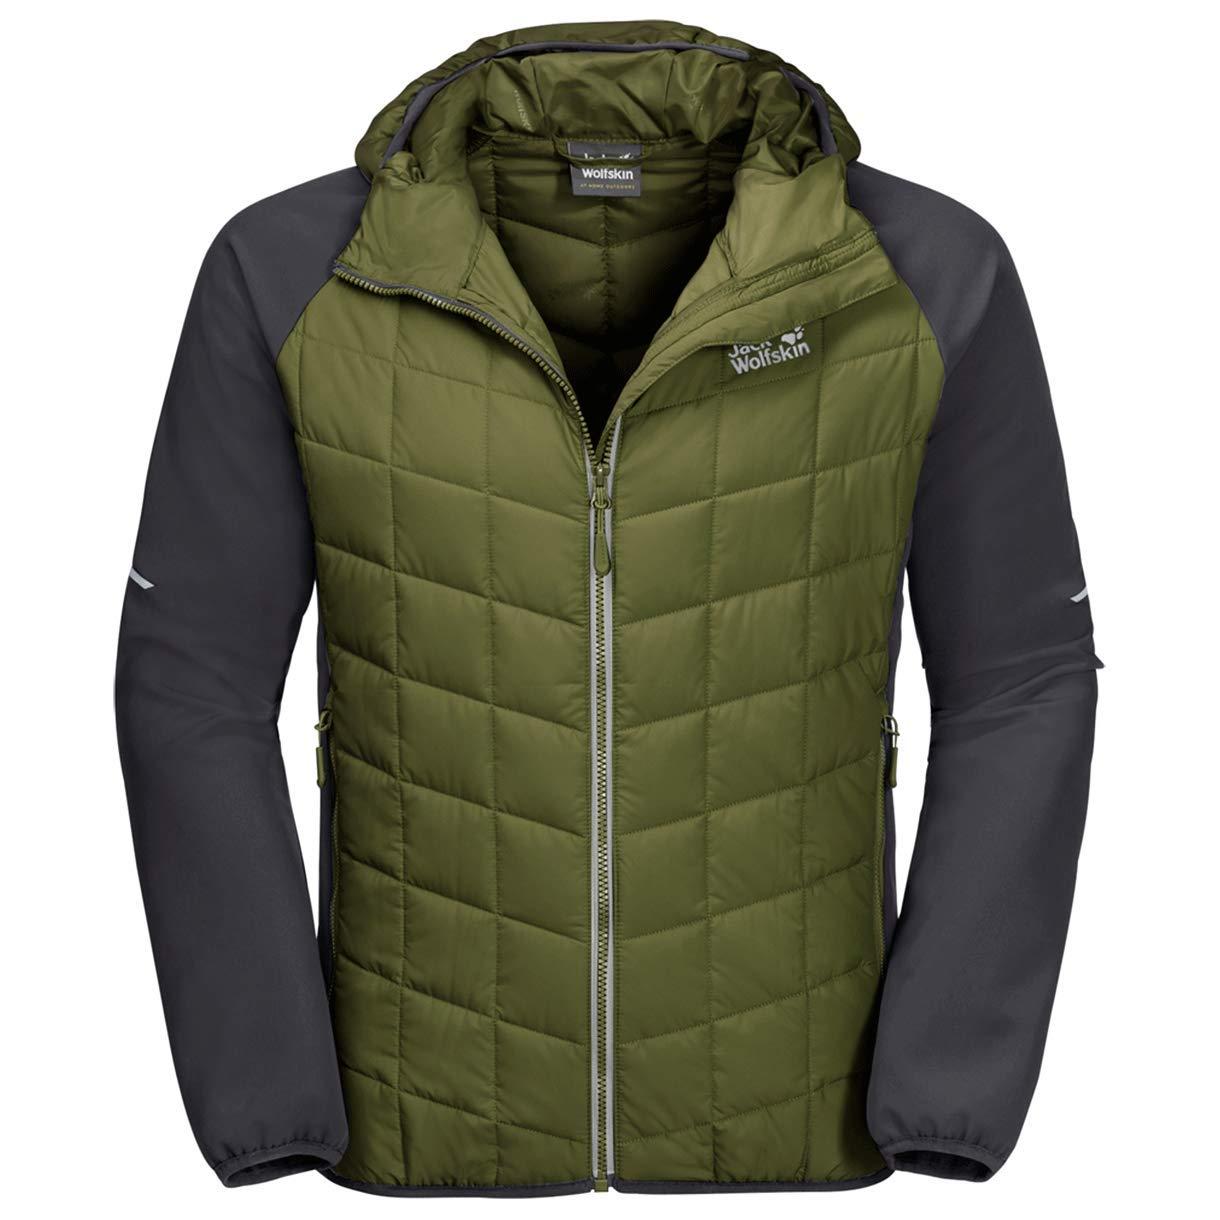 Jack Wolfskin Grassland Hybrid Hood Jacket Outdoor Jacke blue 1204281-1062